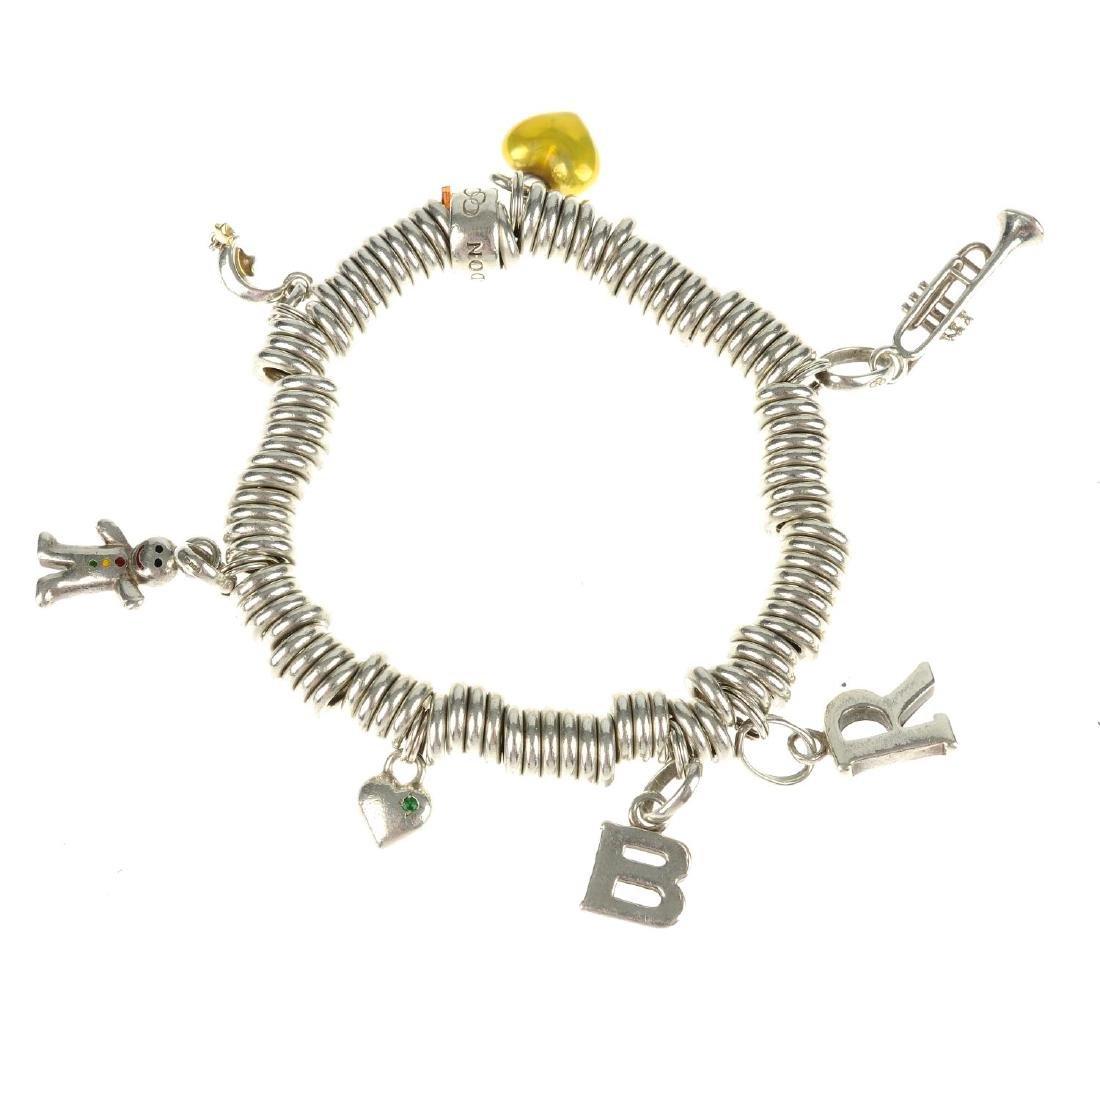 A Links of London charm bracelet and a Thomas Sabo